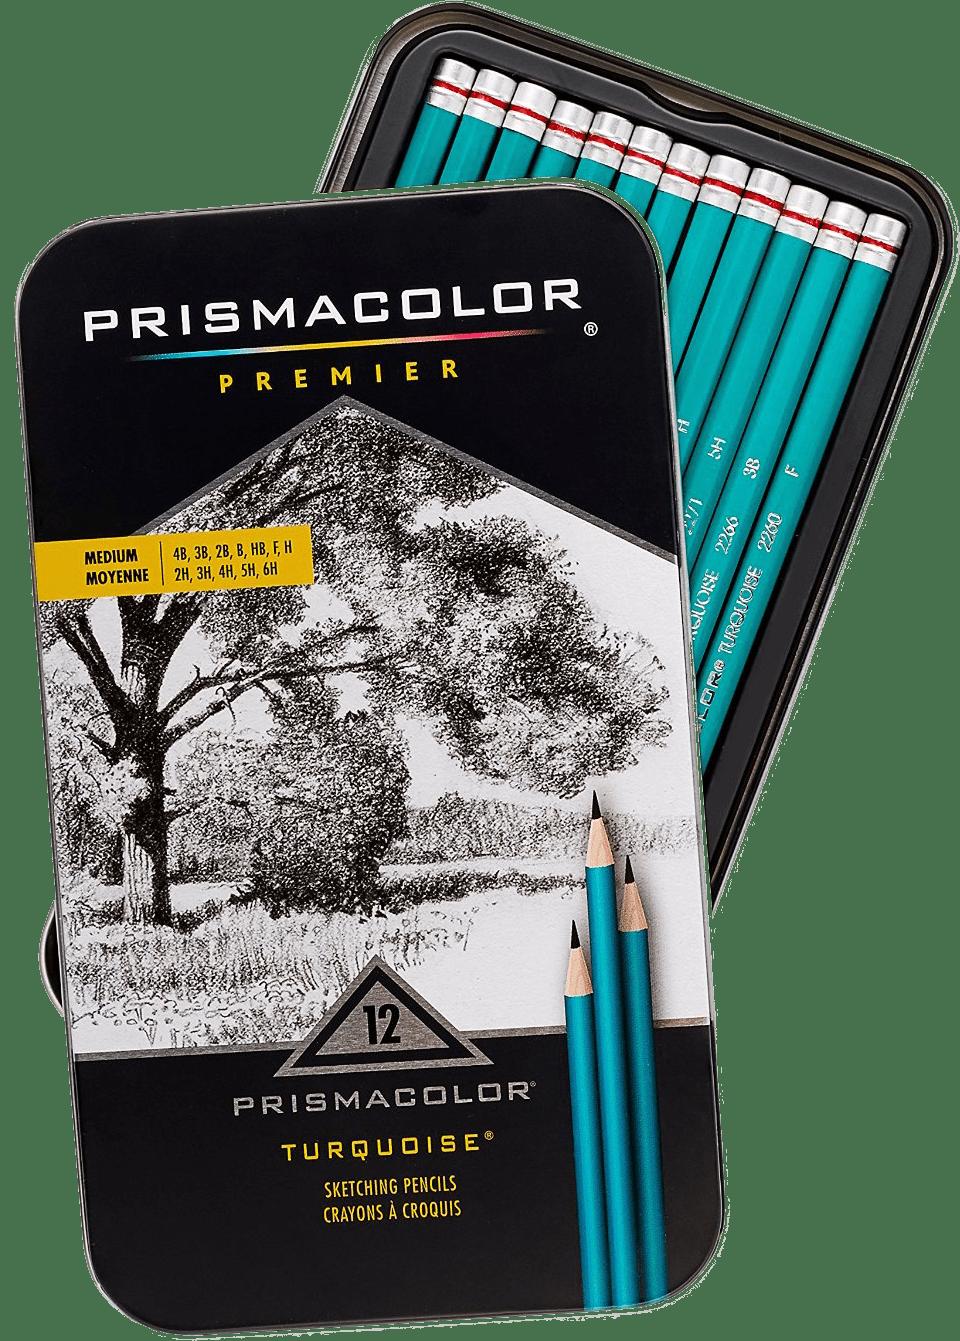 Prismacolor Premier Medium Turquoise Sketching Pencils